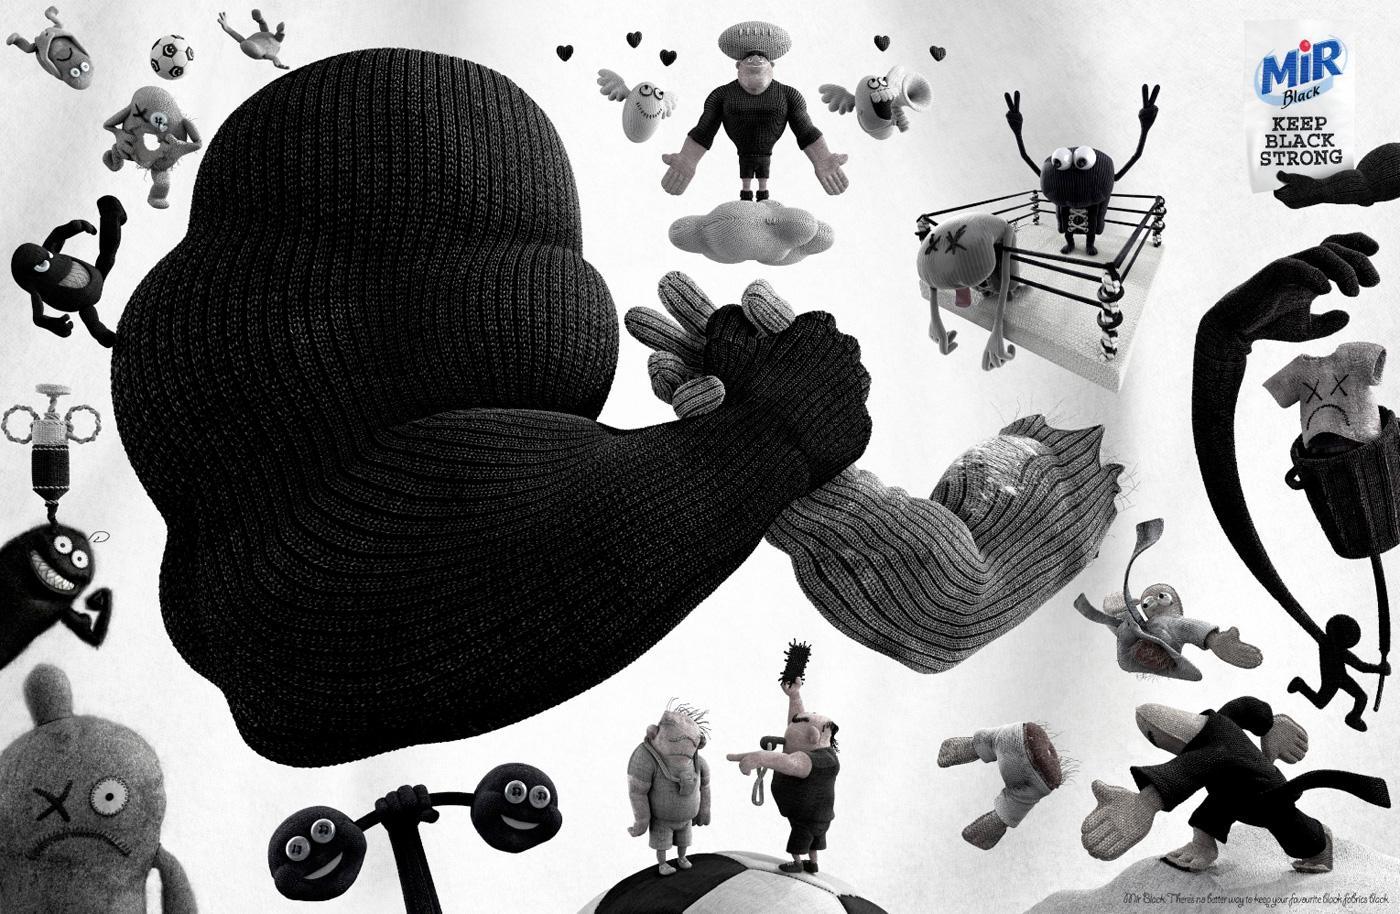 MIR Black Print Ad -  Keep black strong, 3